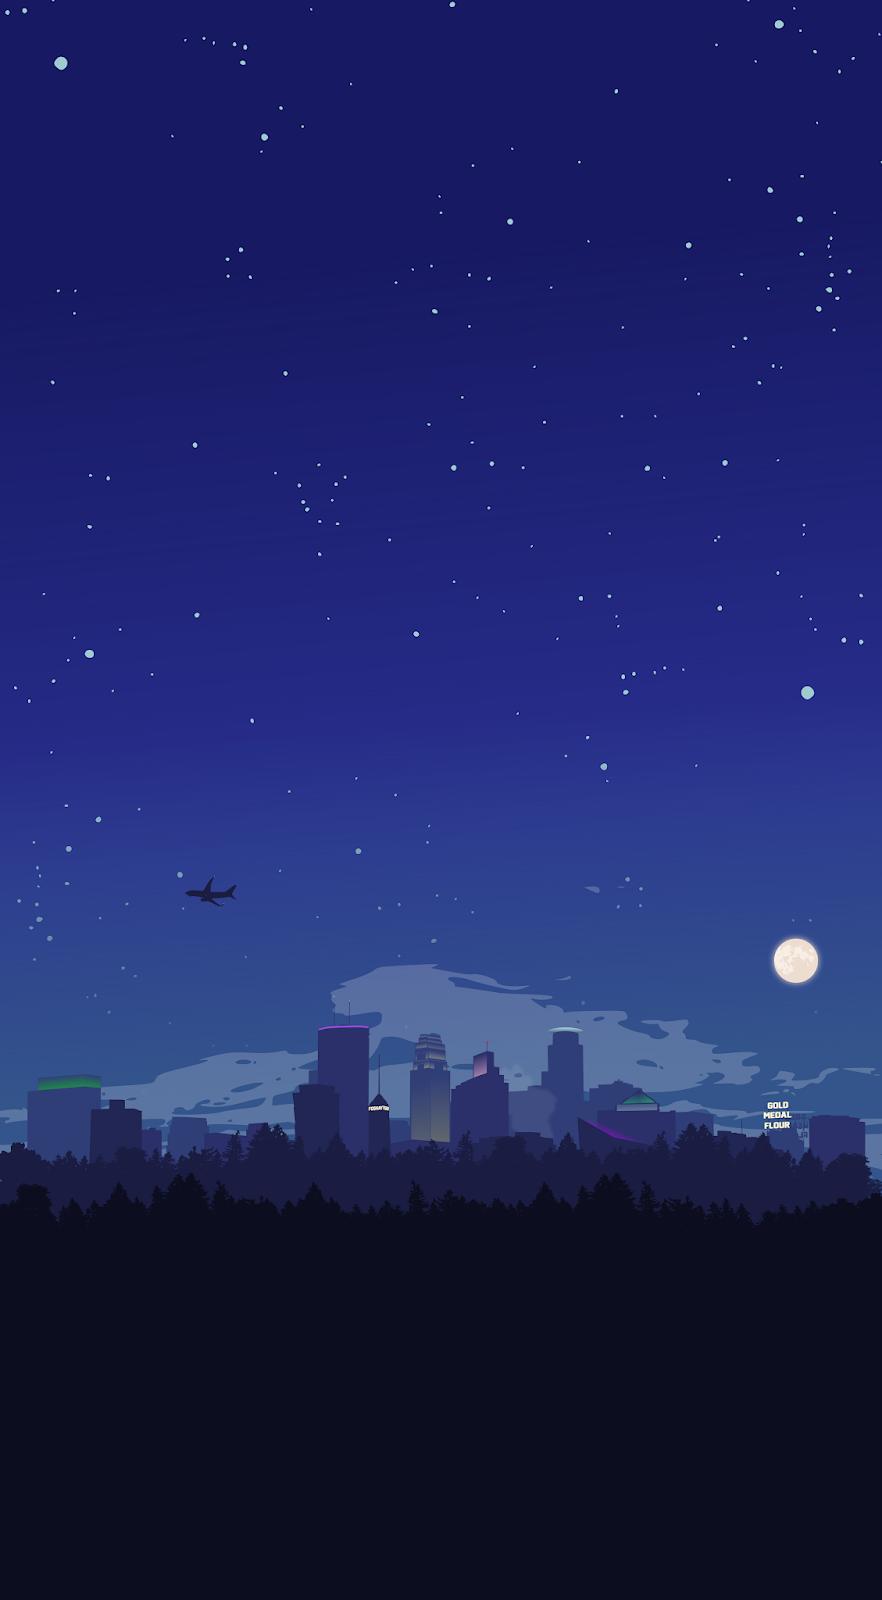 Minneapolis at night [OC]